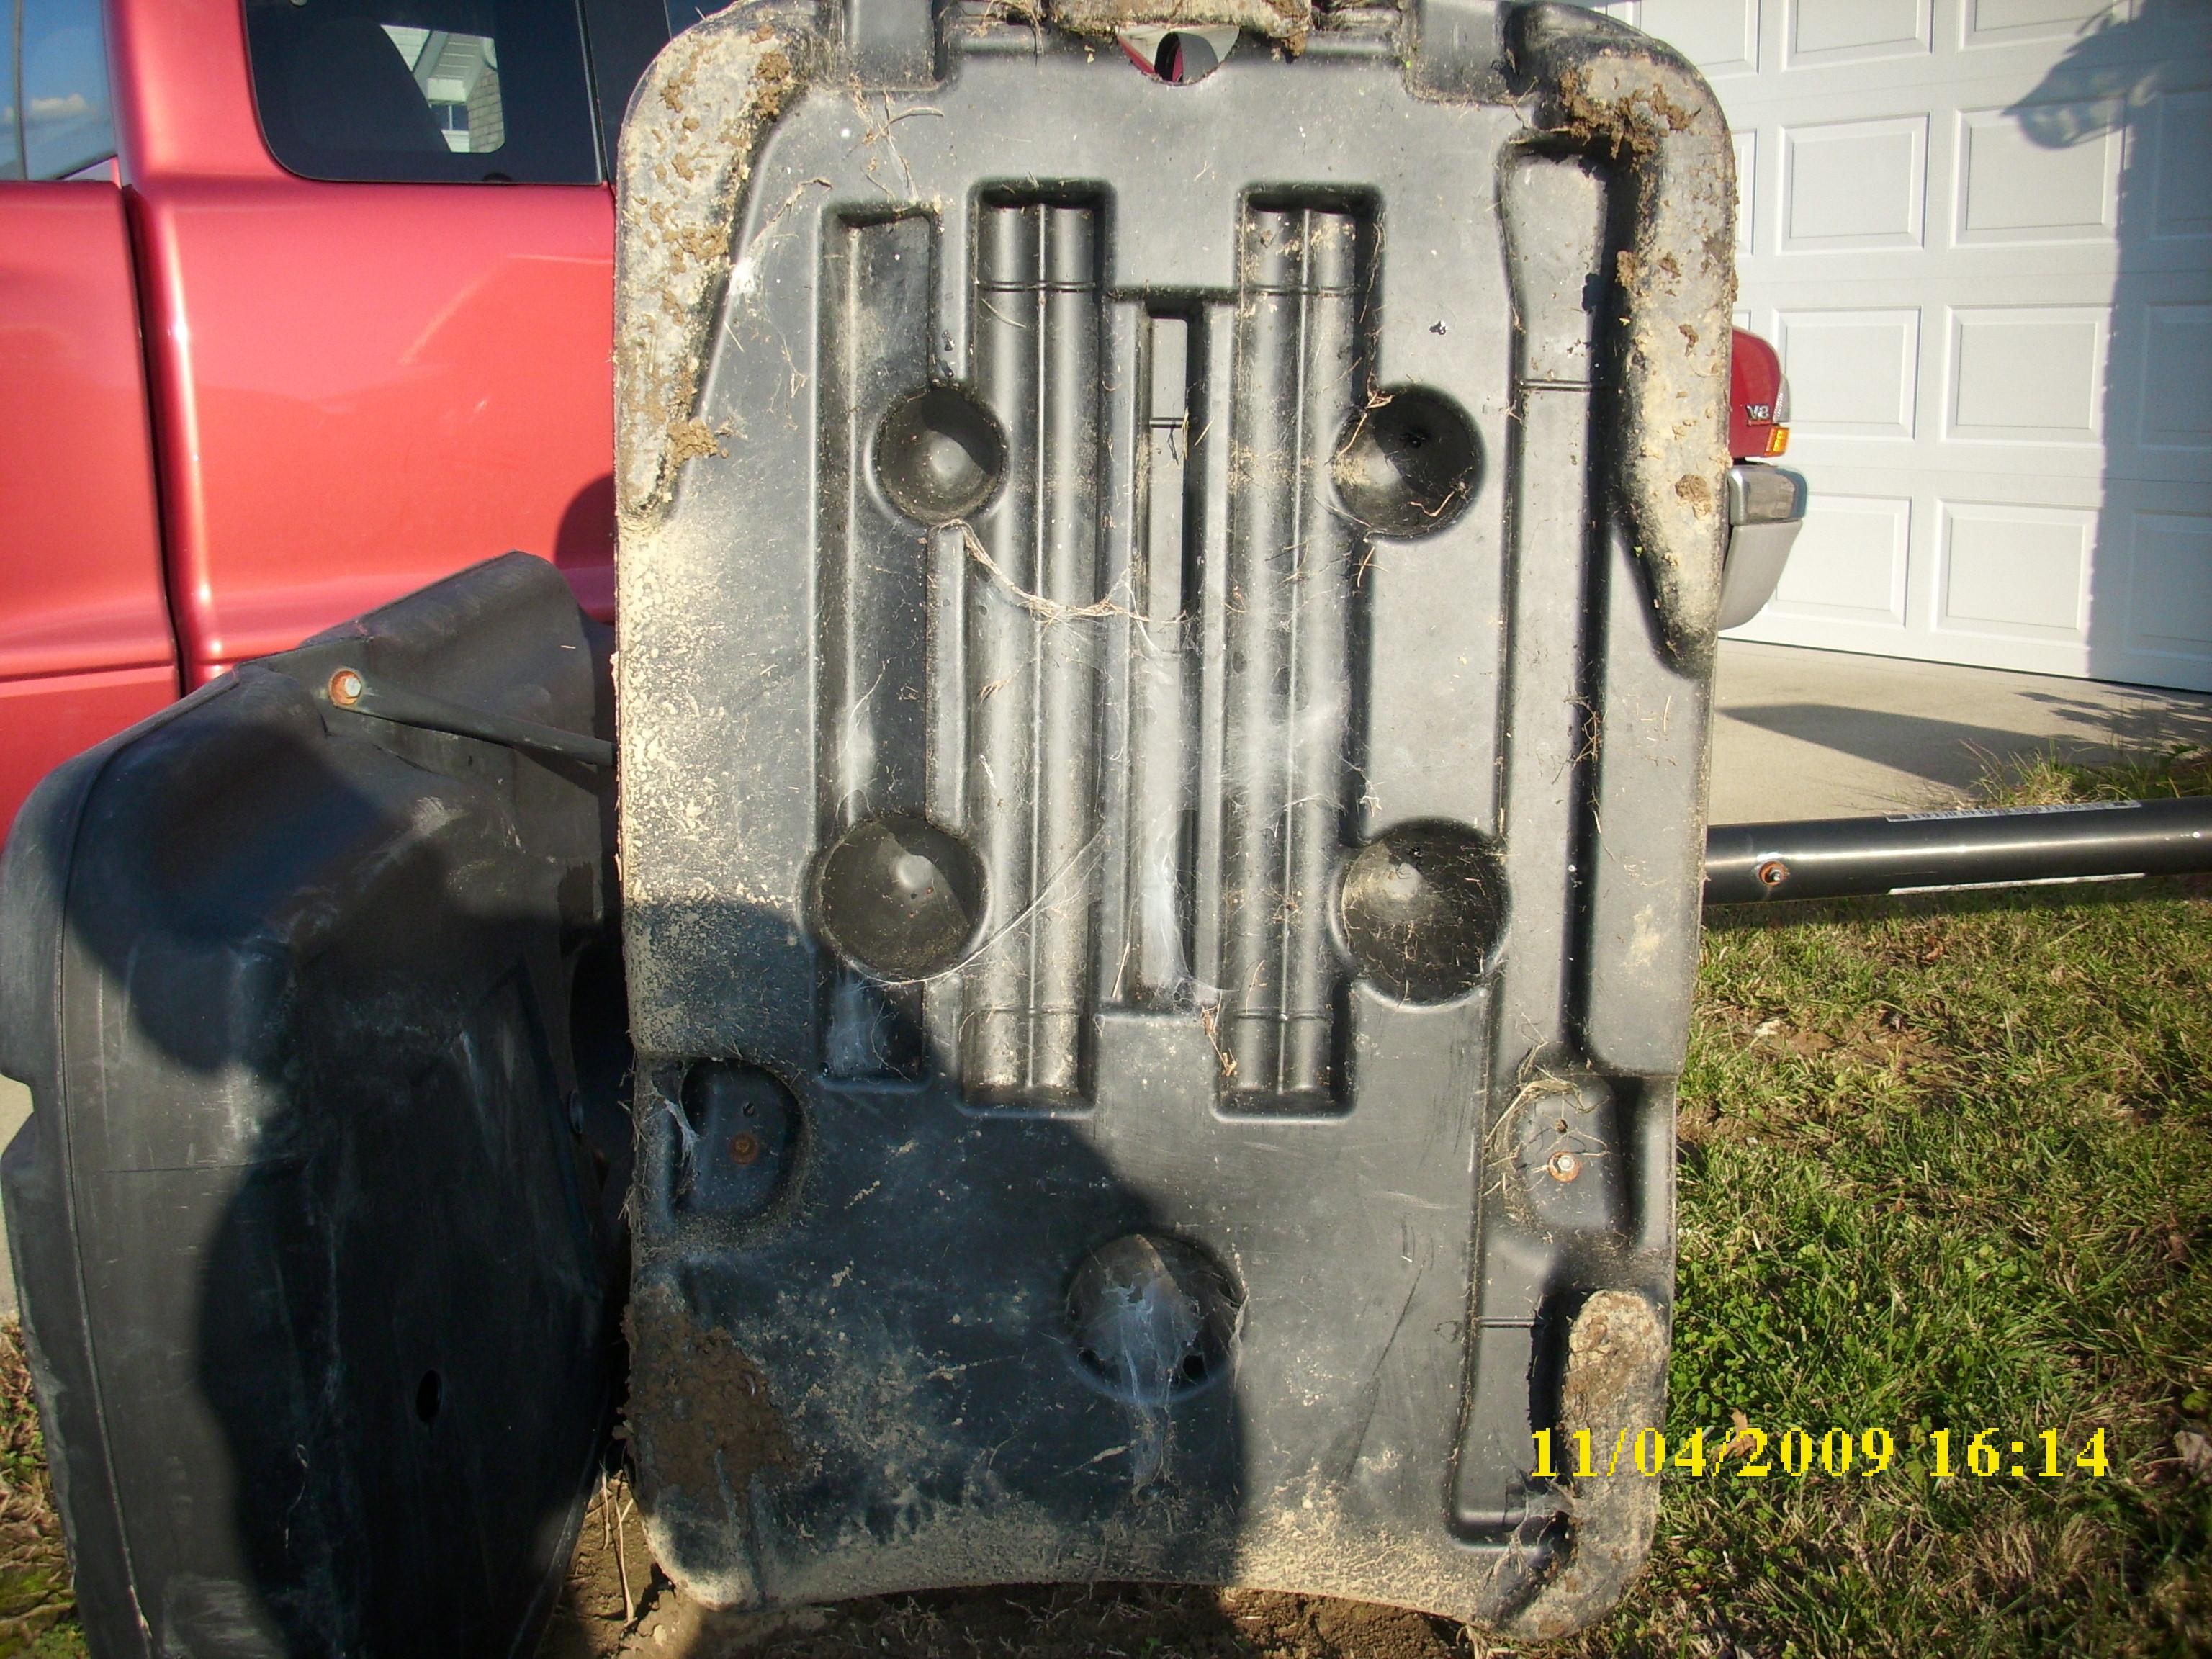 Bballgoal1 Swat Team Pest Control Services Of Kentucky